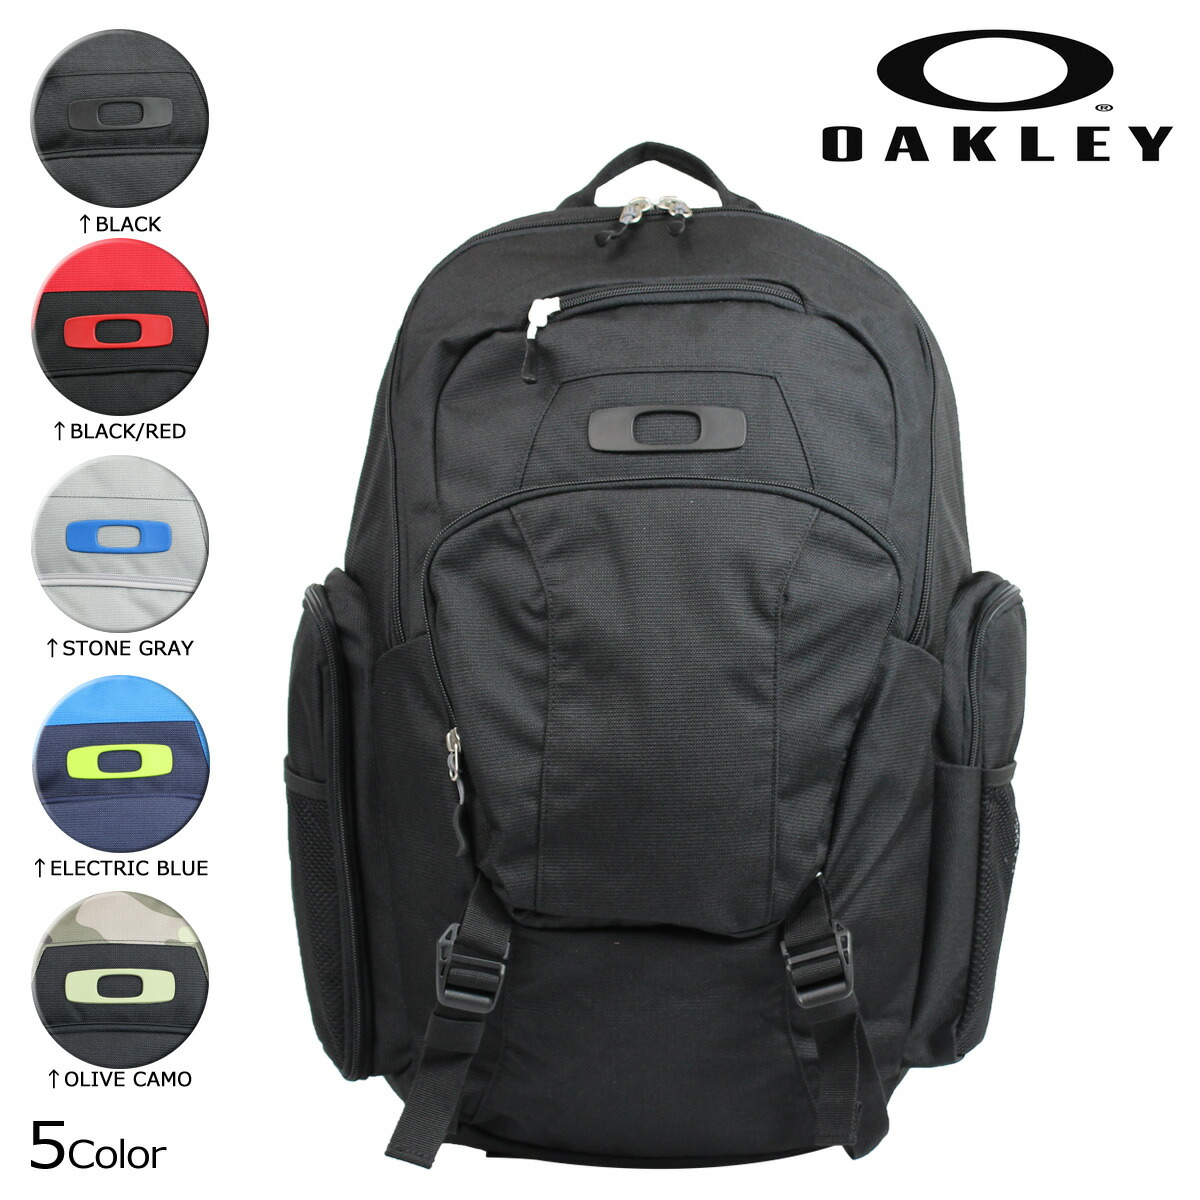 c8228ddb09 Oakley Blade Wet Dry 30 Black « Heritage Malta